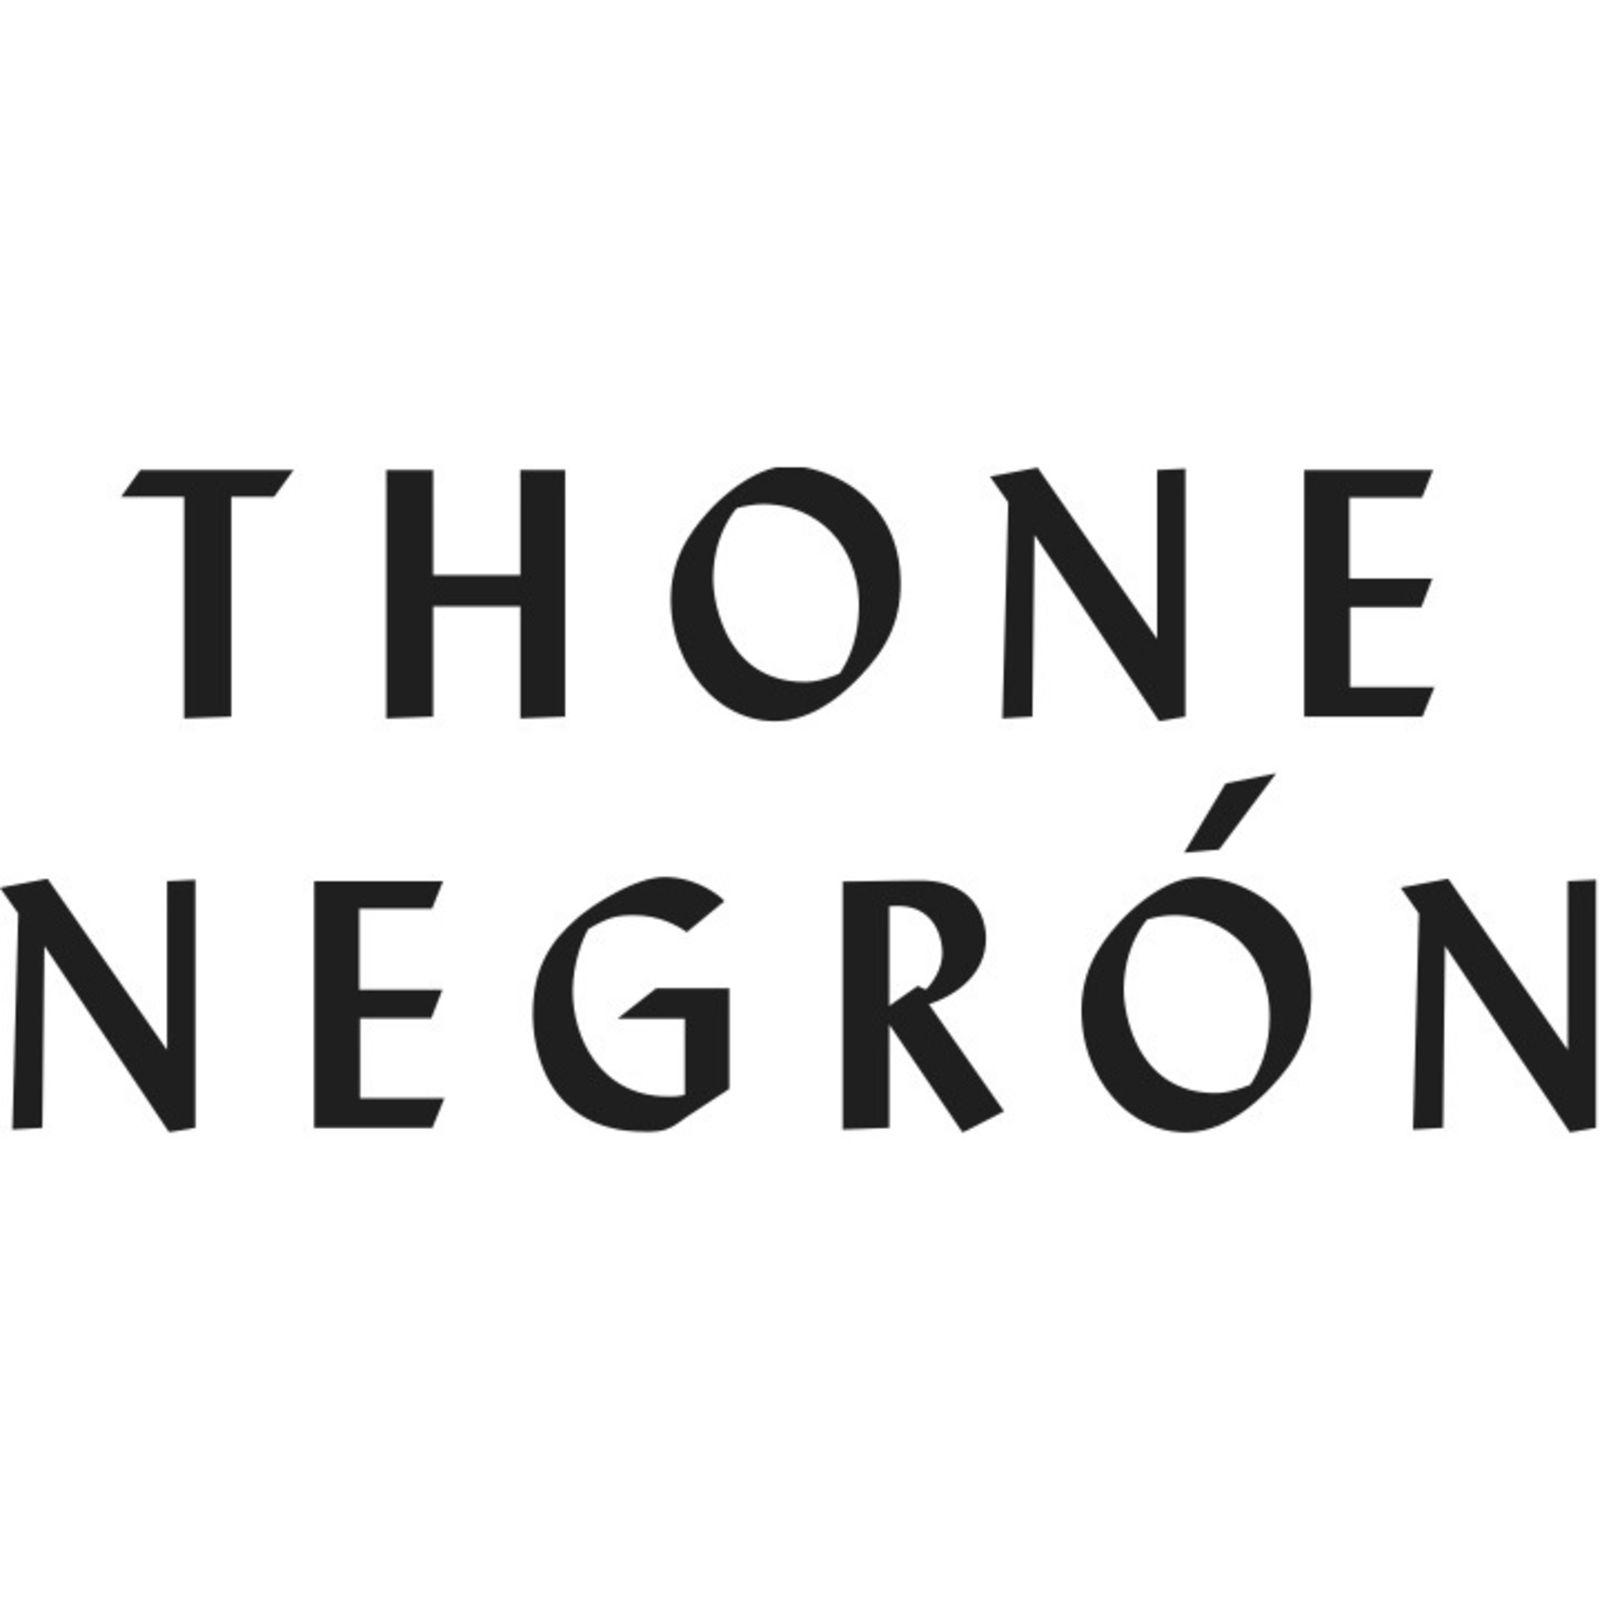 THONE NEGRÓN